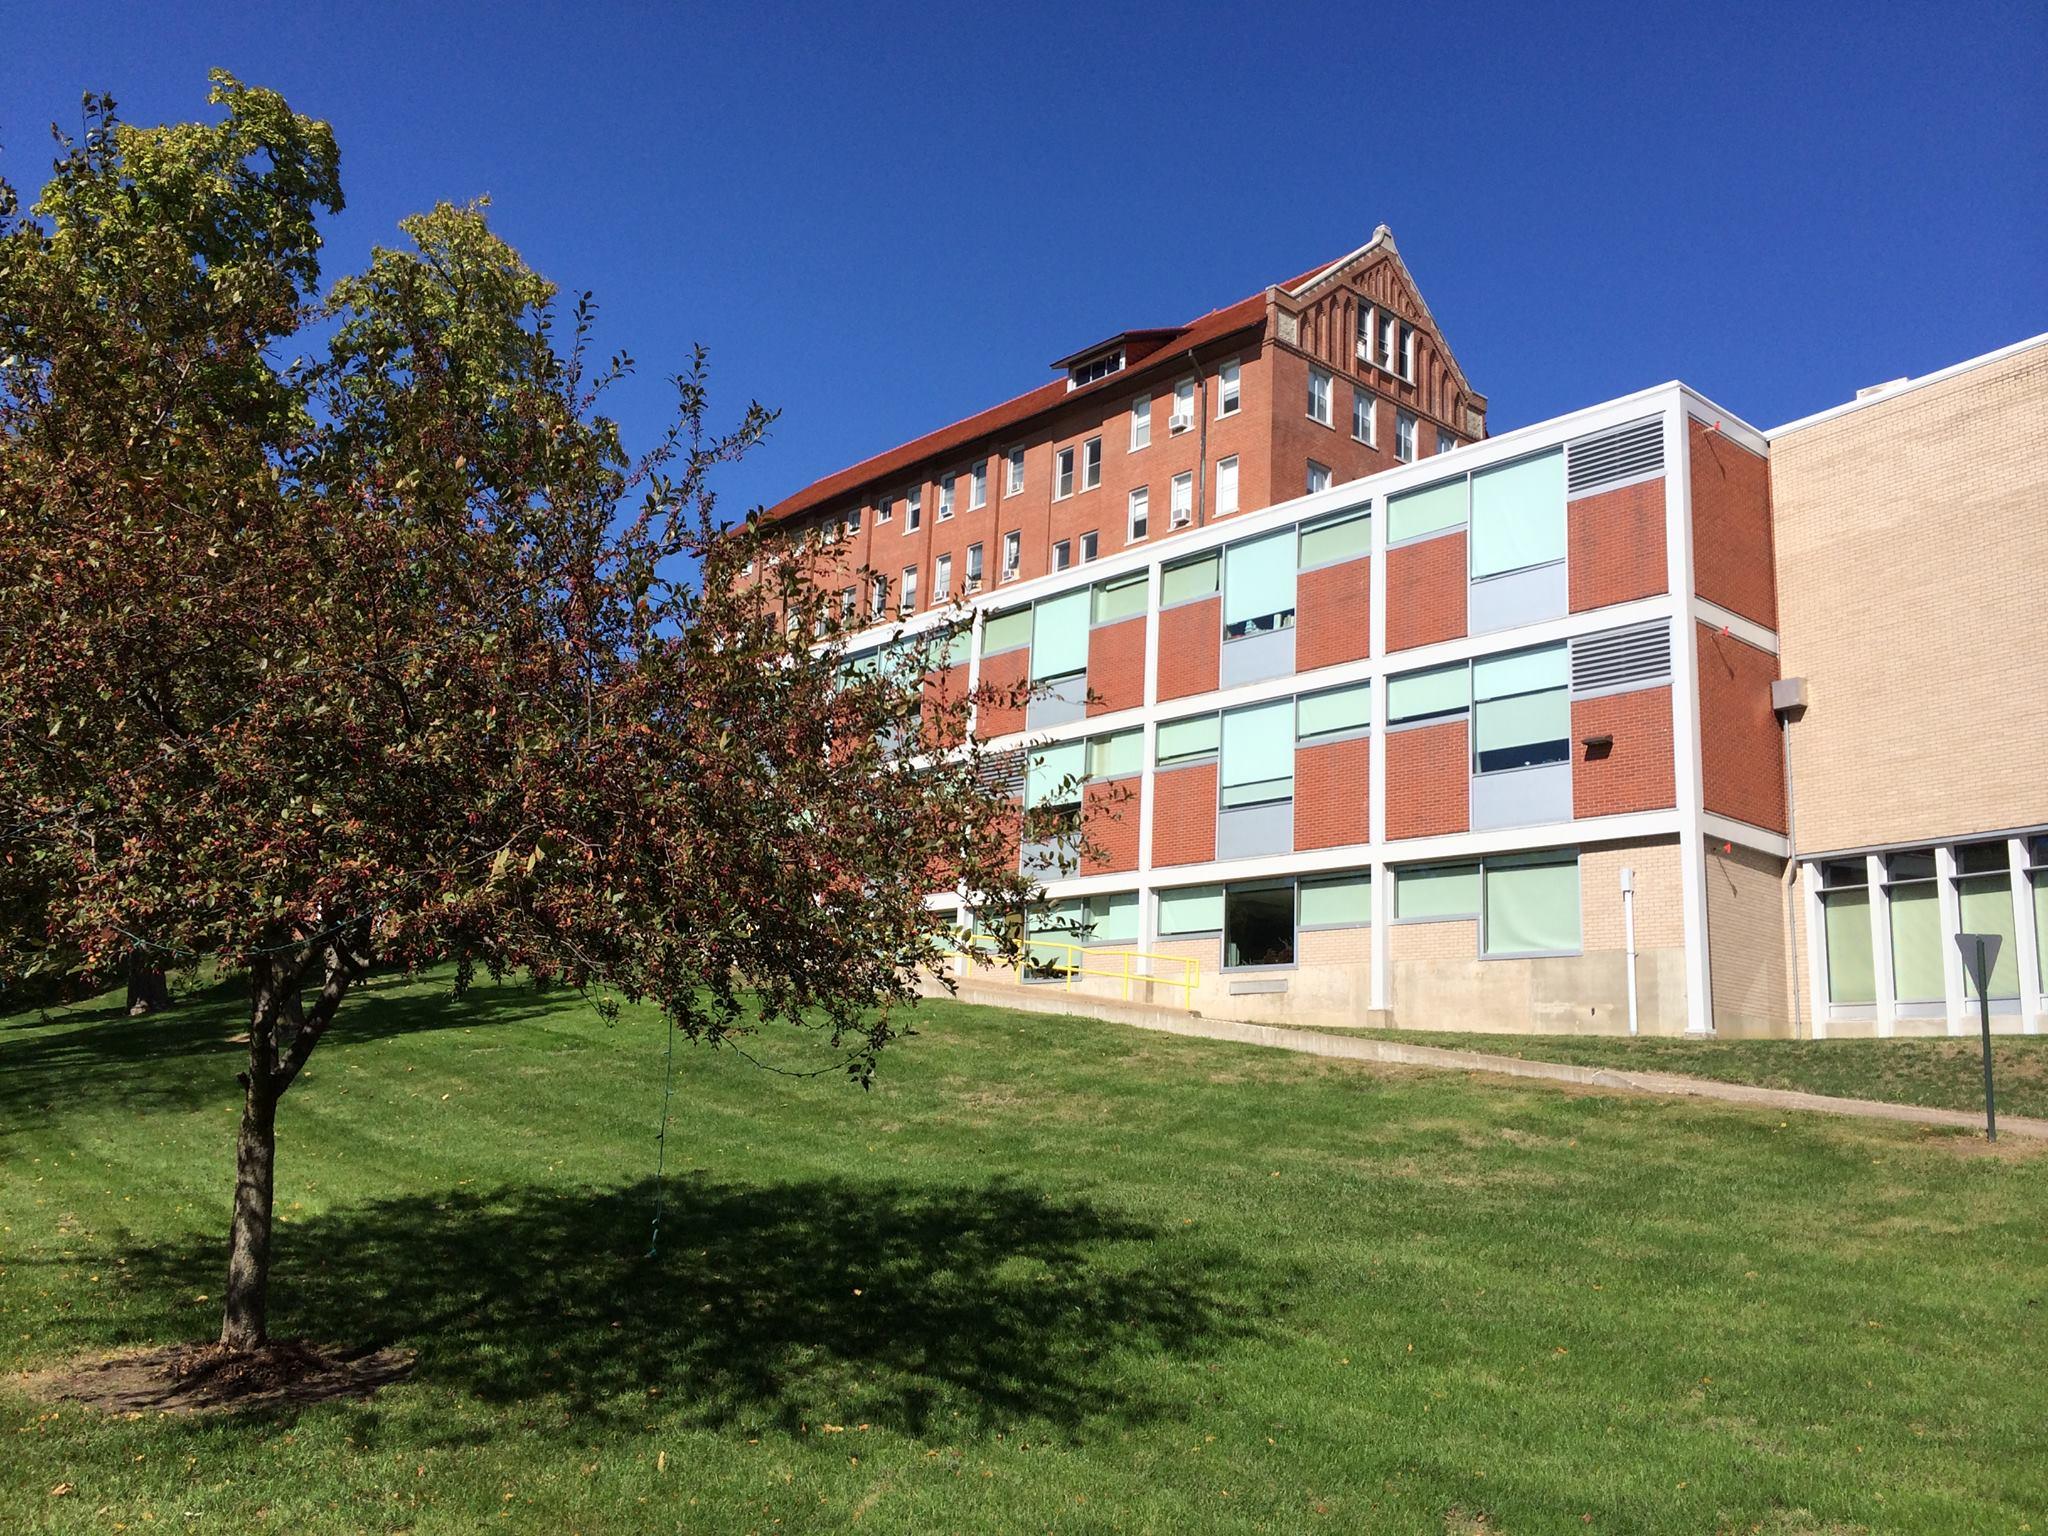 Ashford Closing Clinton Campus | WVIK